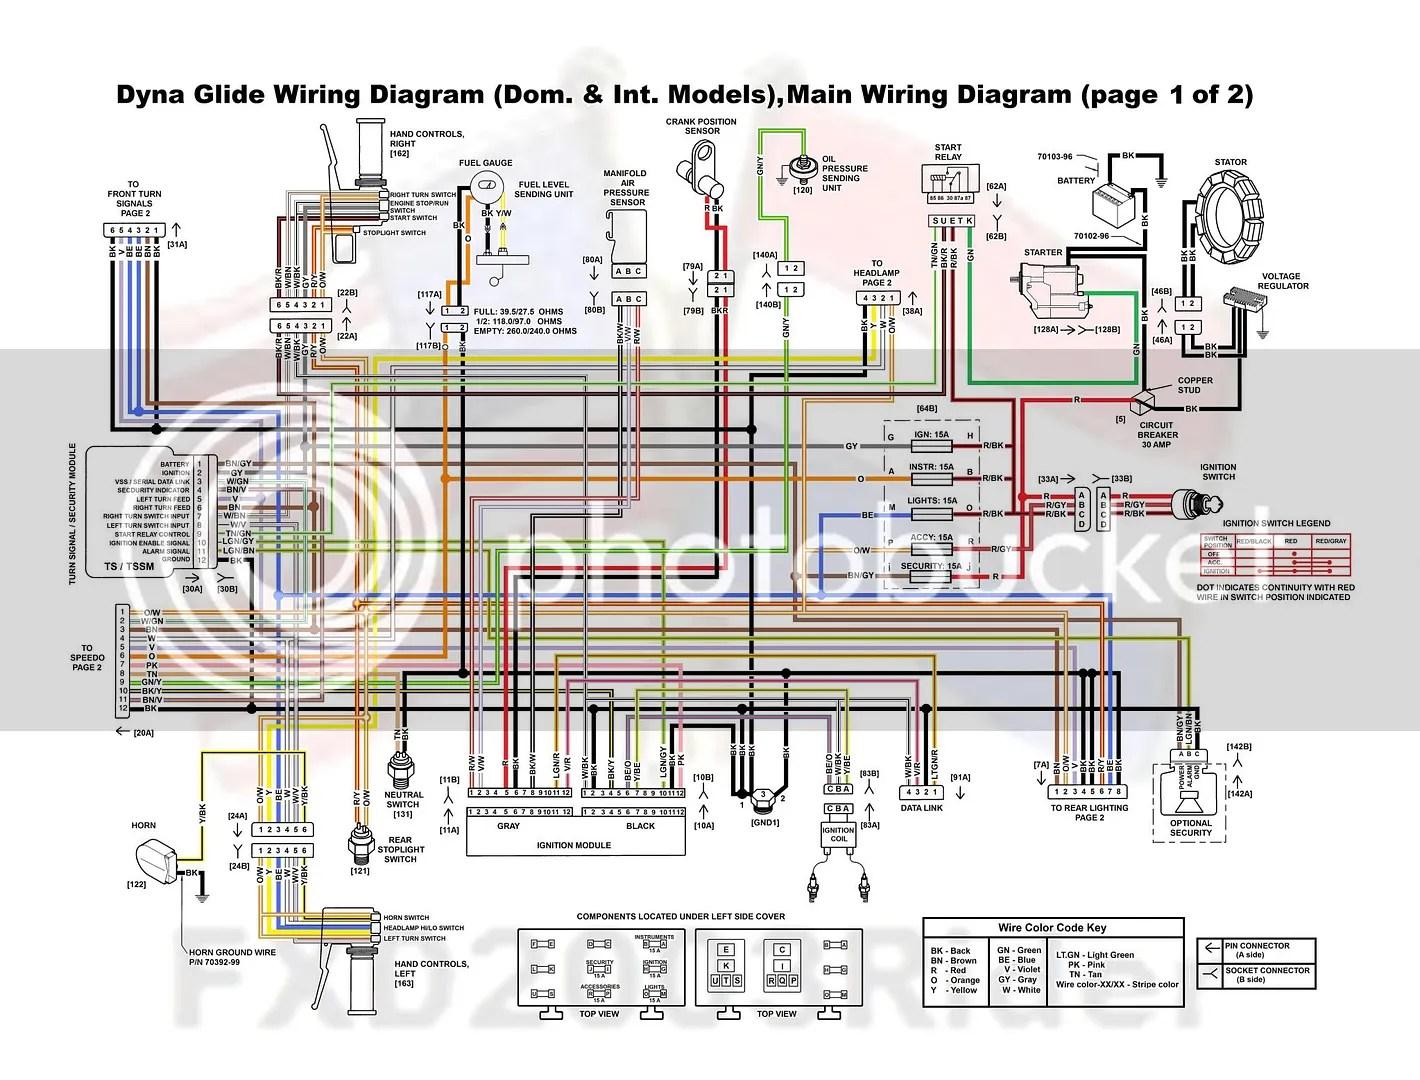 harley softail wiring harness wiring diagram toolbox 200 harley softail wiring harness wiring diagram toolbox harley [ 1420 x 1080 Pixel ]